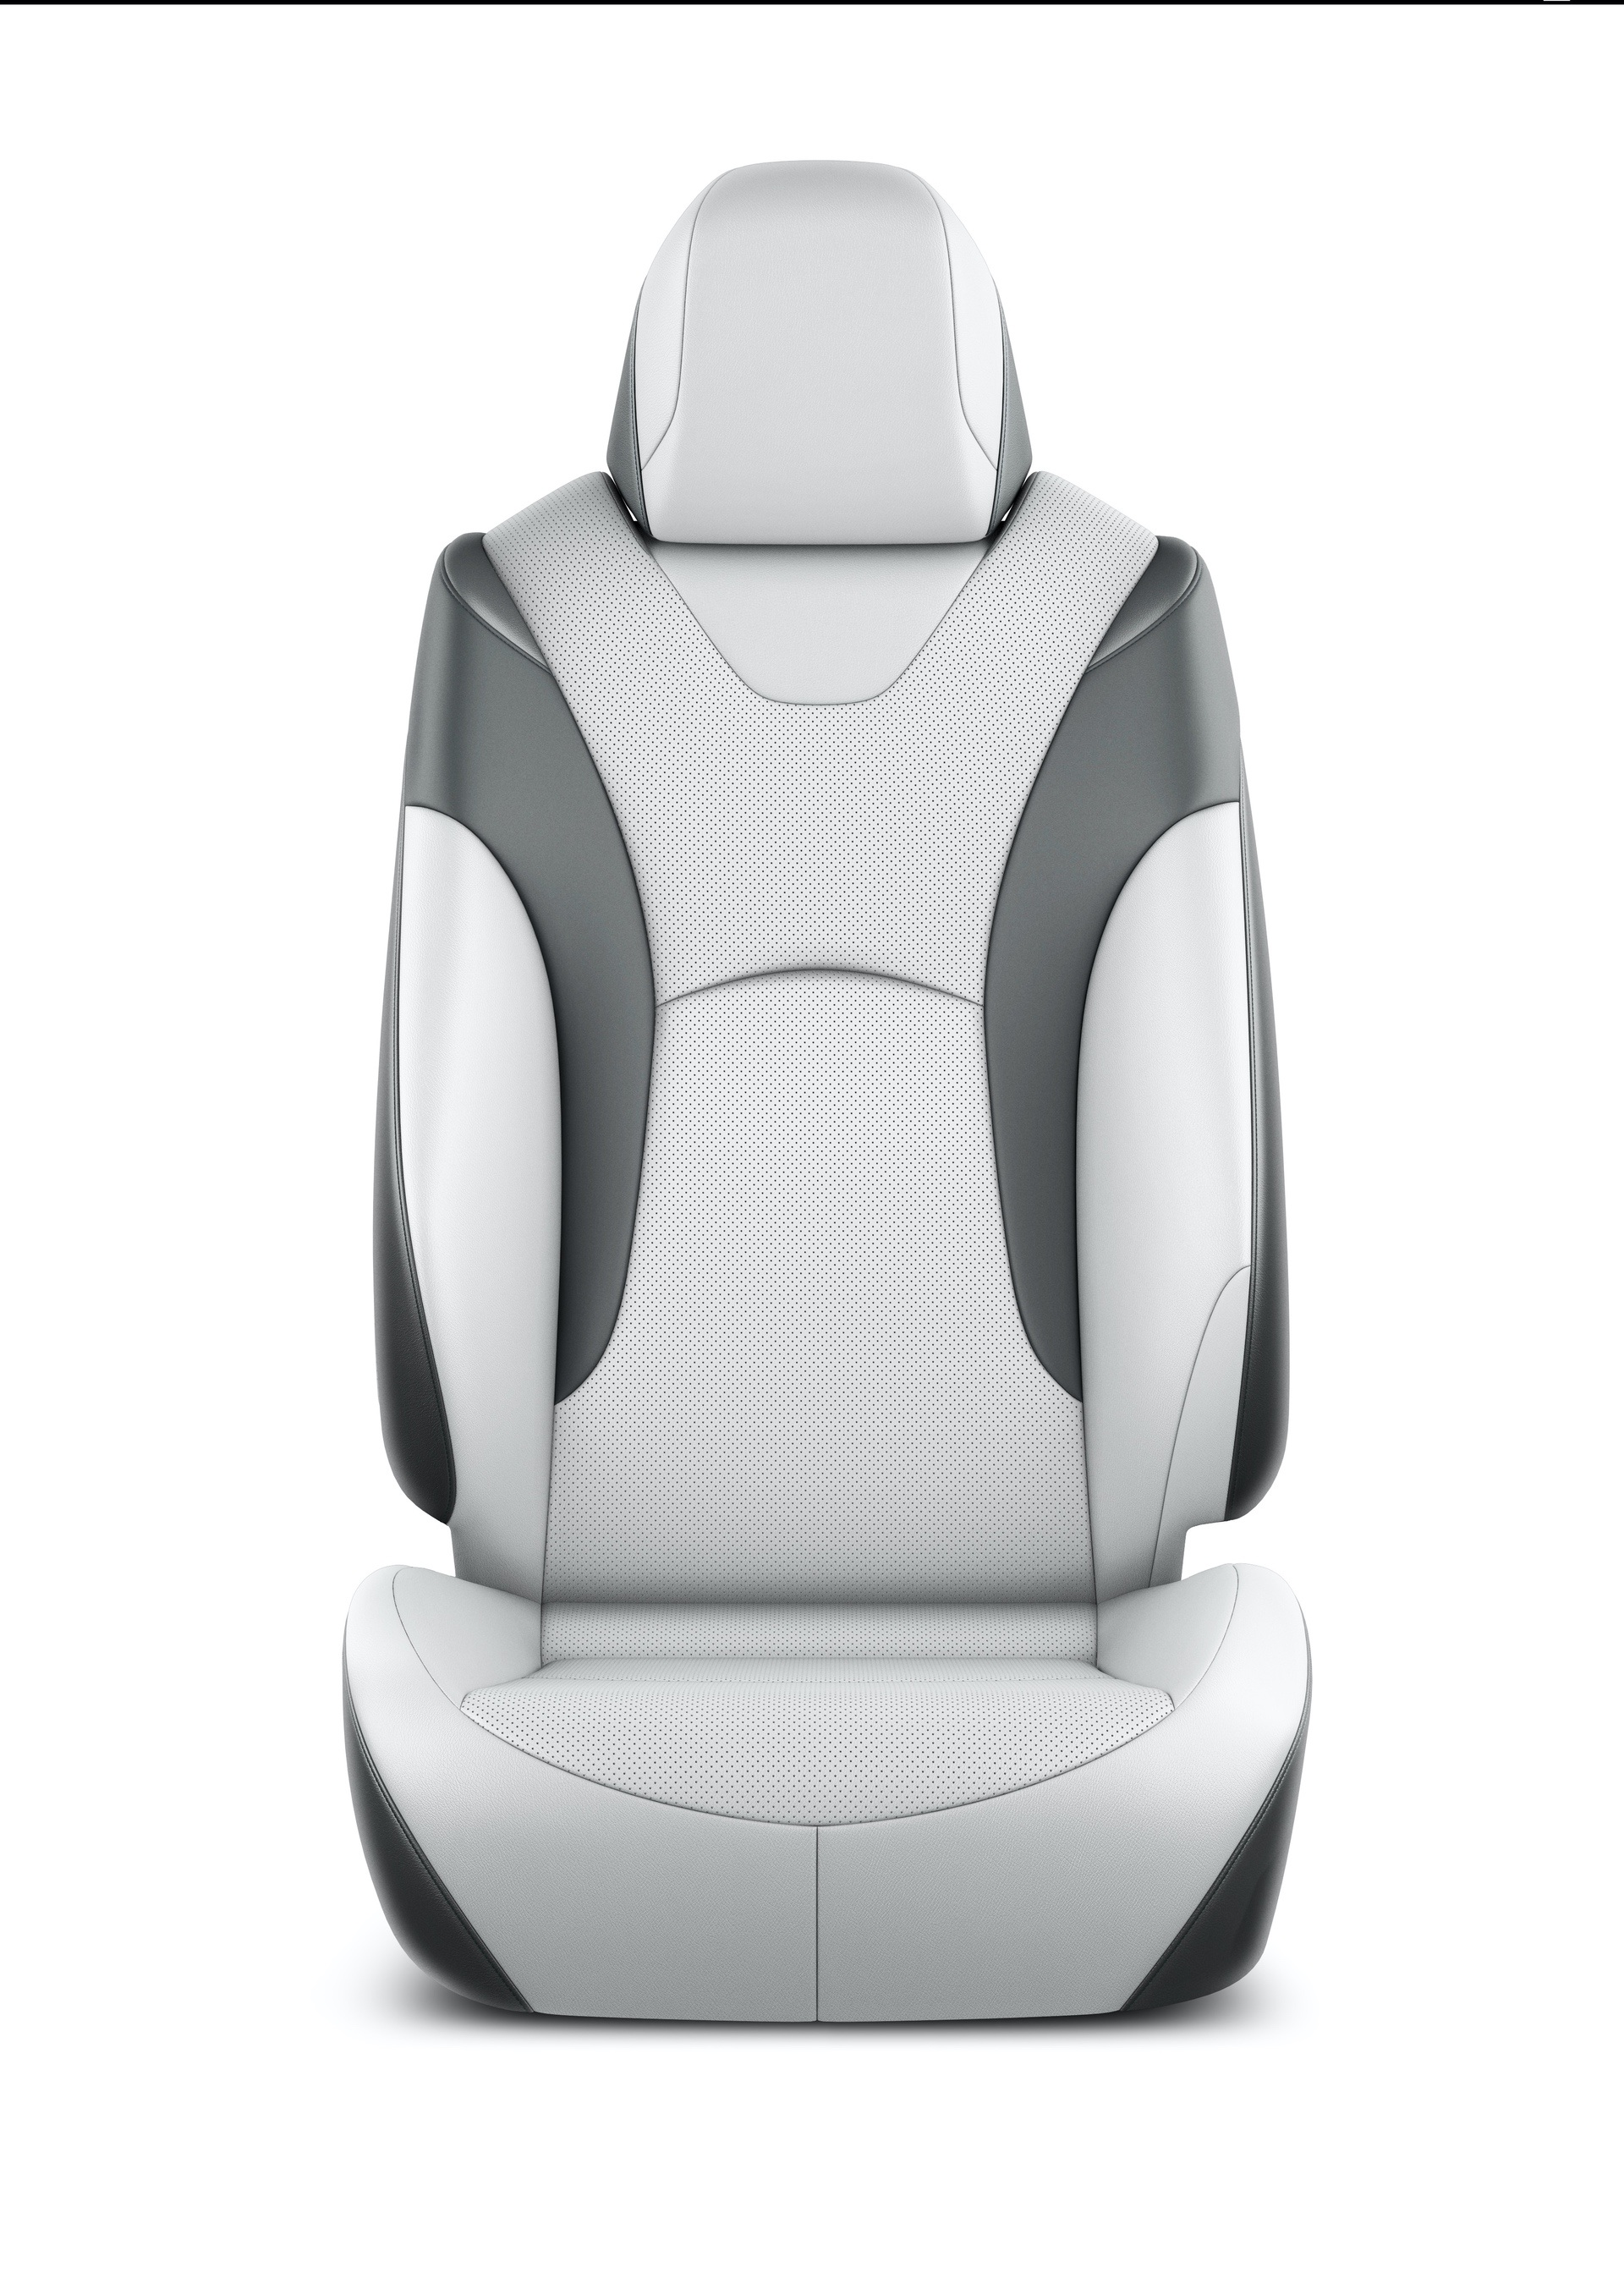 2019_Toyota_Prius_Plug-in_Hybrid_0010